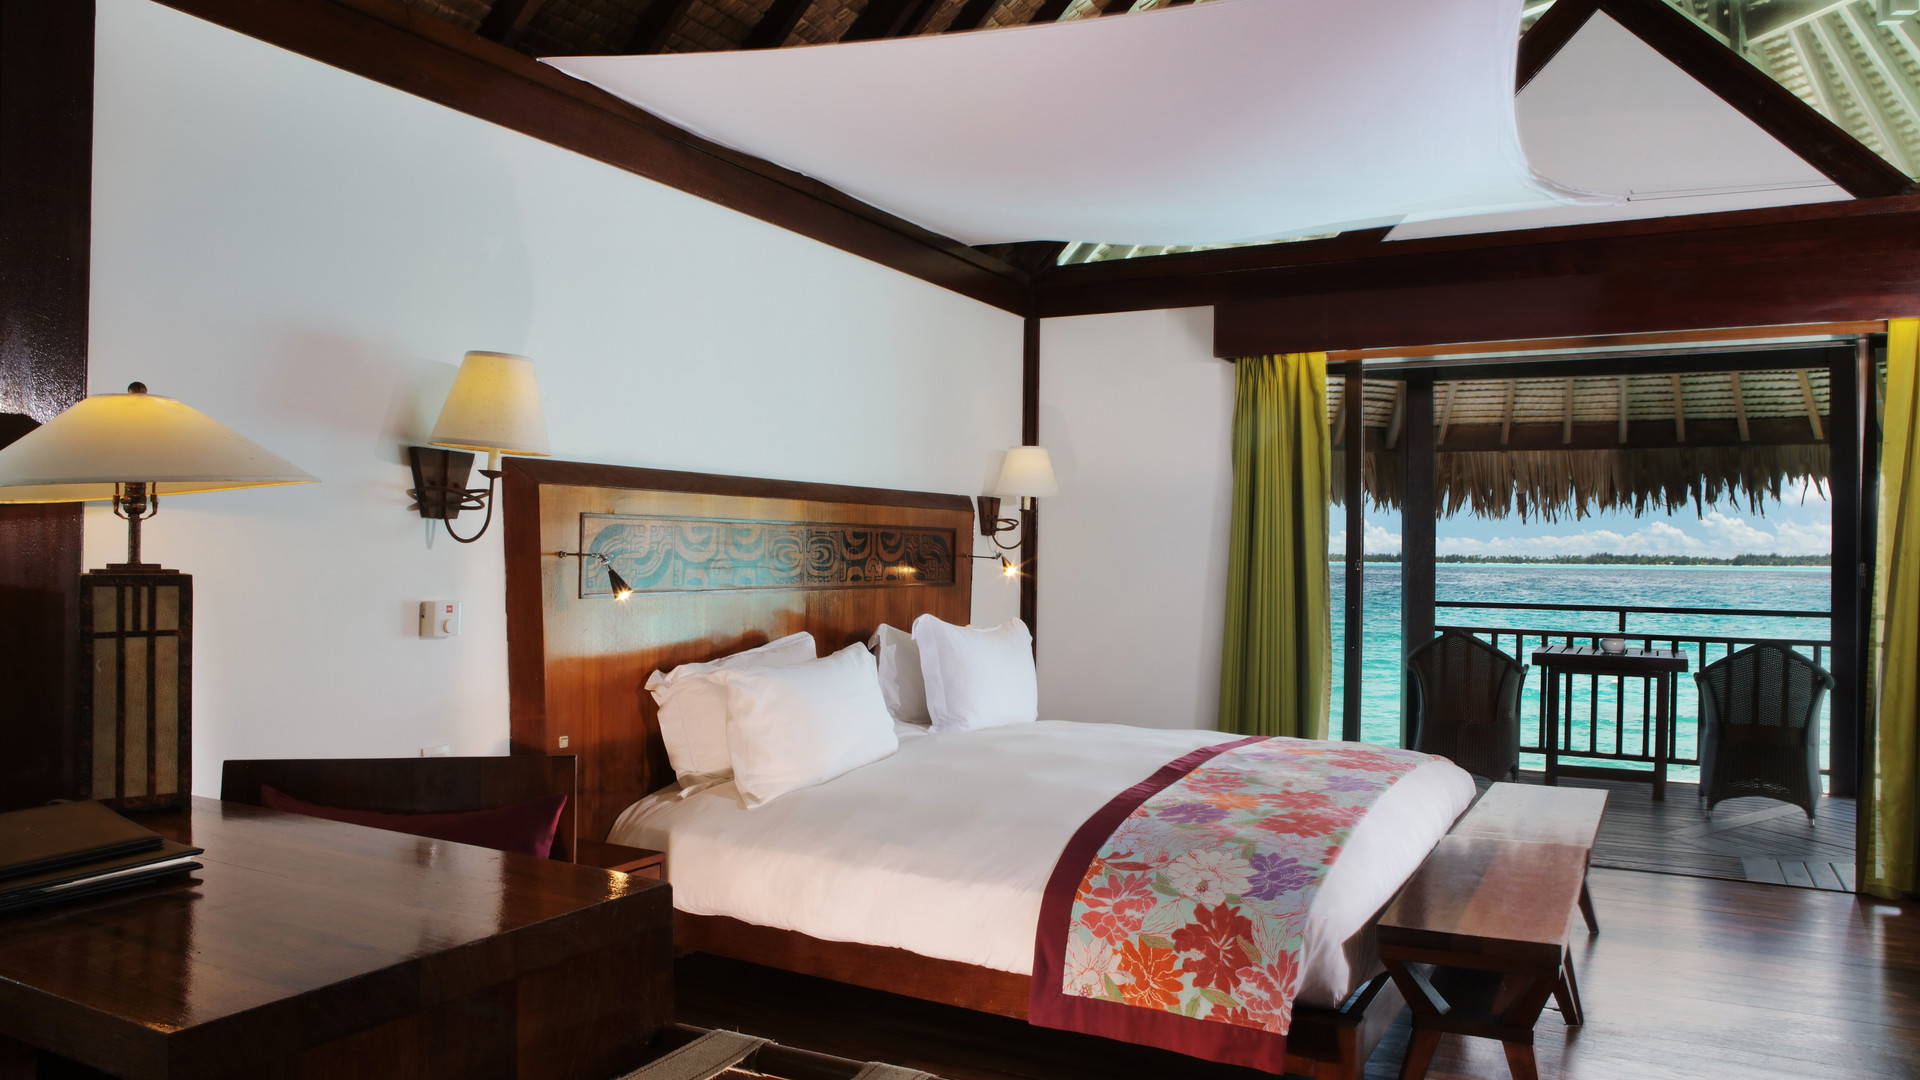 Sofitel_Bora_Bora_Private_Island-Luxury_Overwater_Bungalow_Lagunenblick